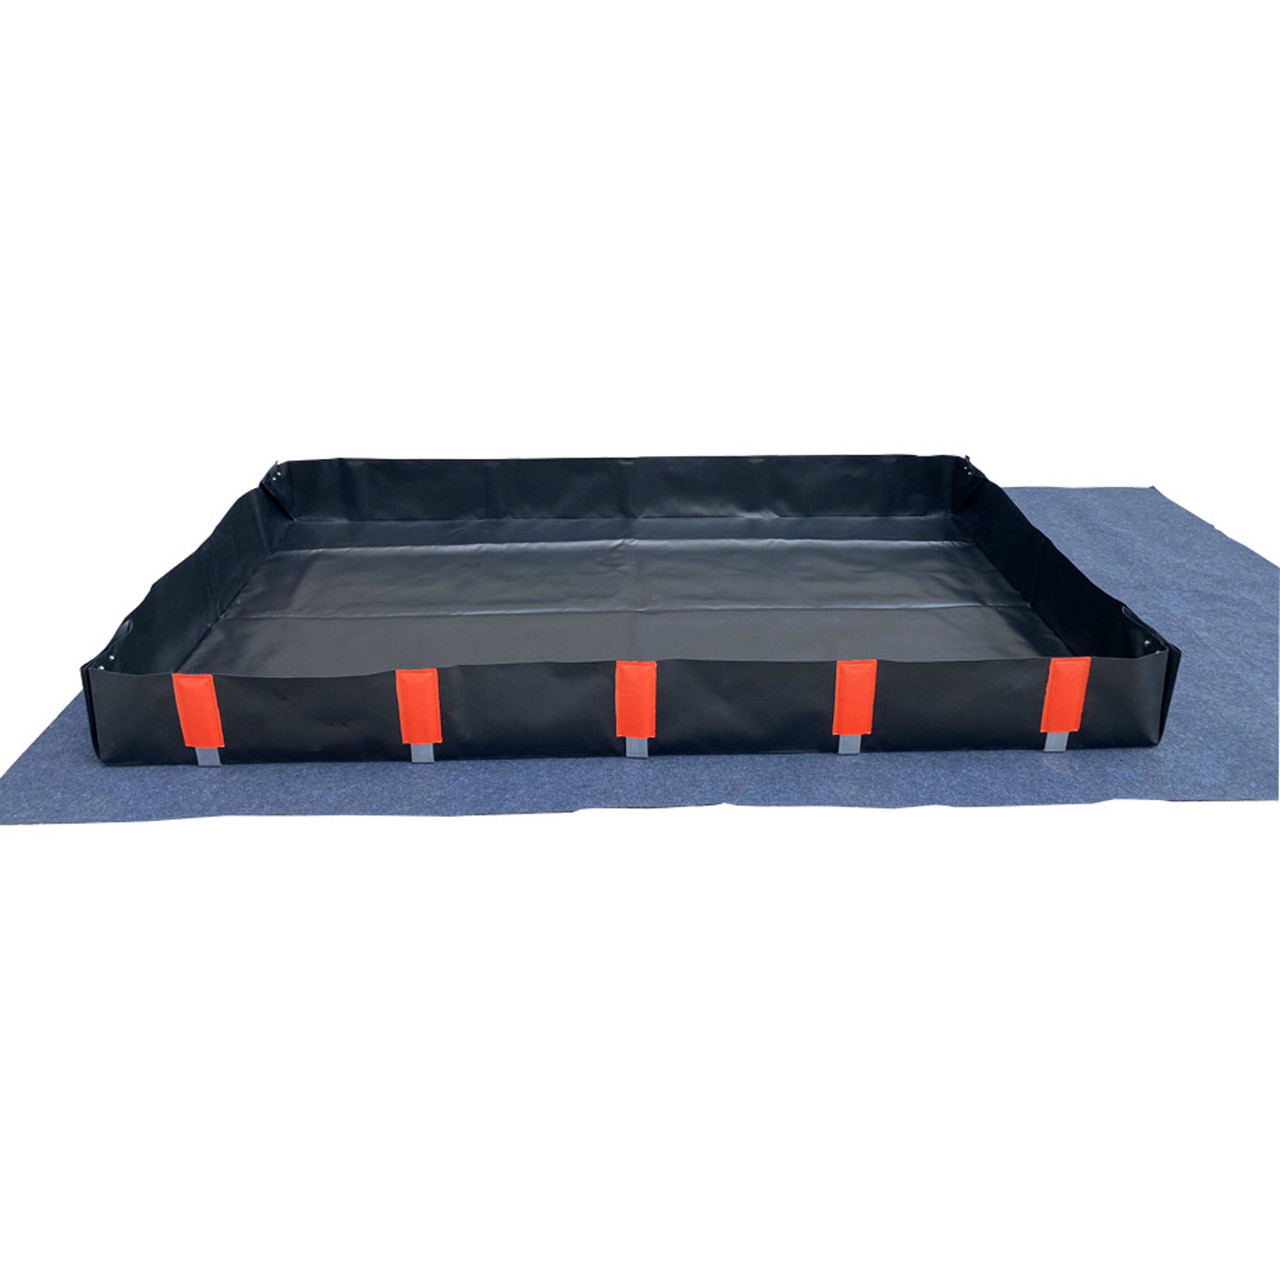 EB4 937ltr Portable Multi Function Bund (2500x1500x250mm)